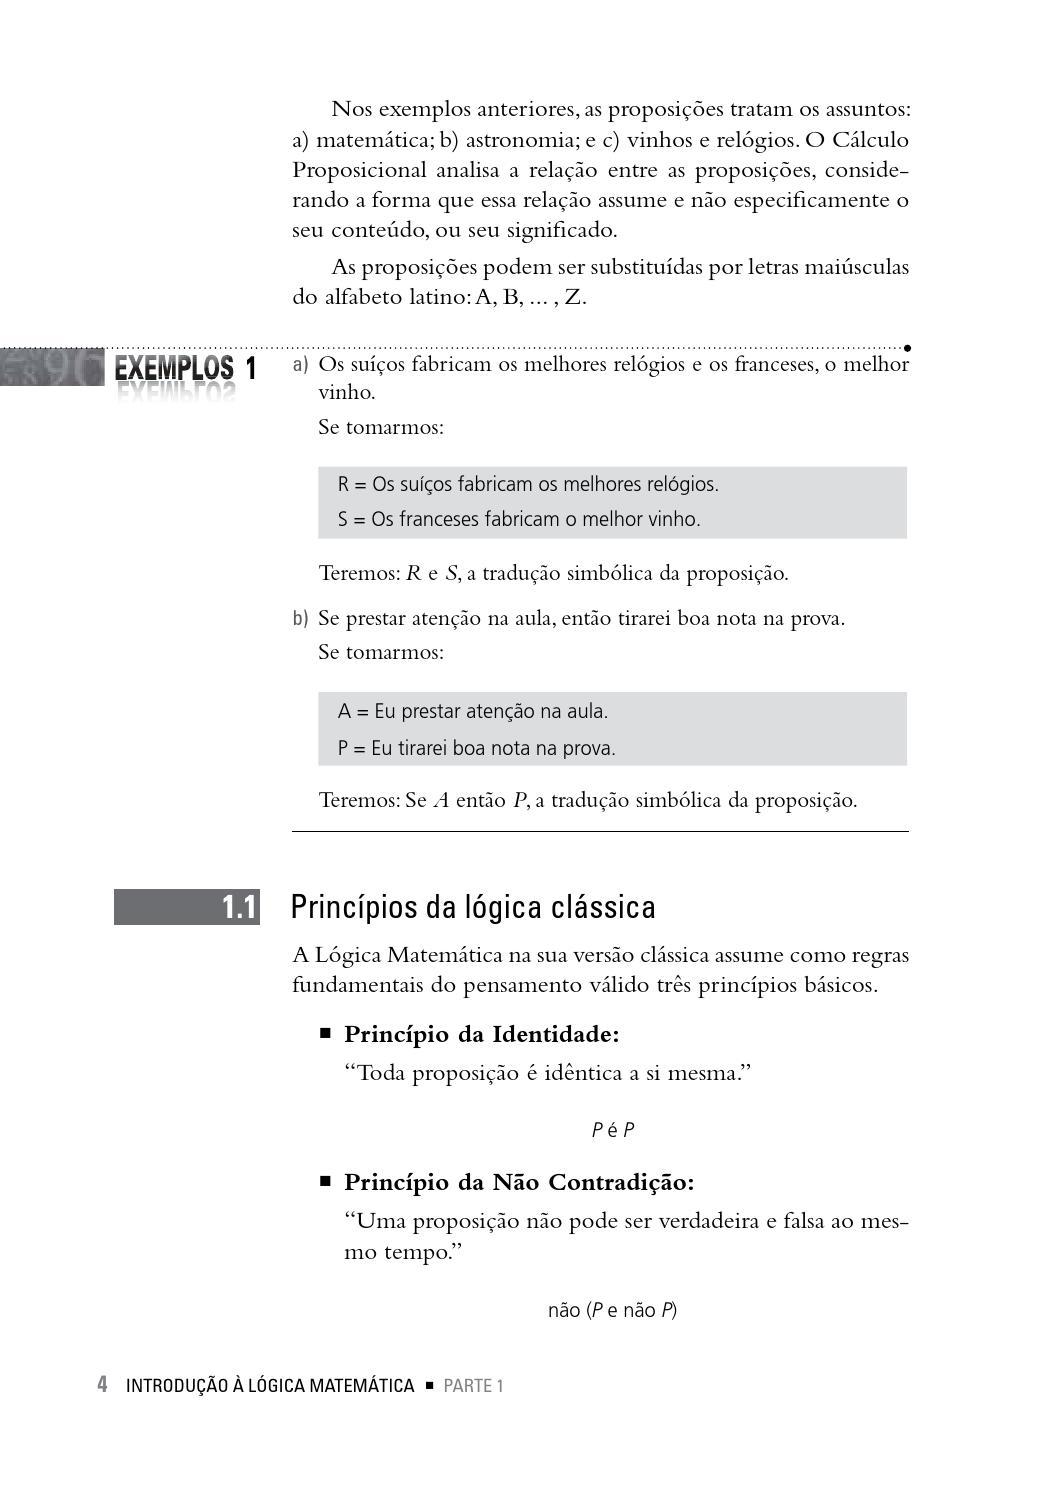 Introdução à Lógica Matemática By Cengage Brasil Issuu